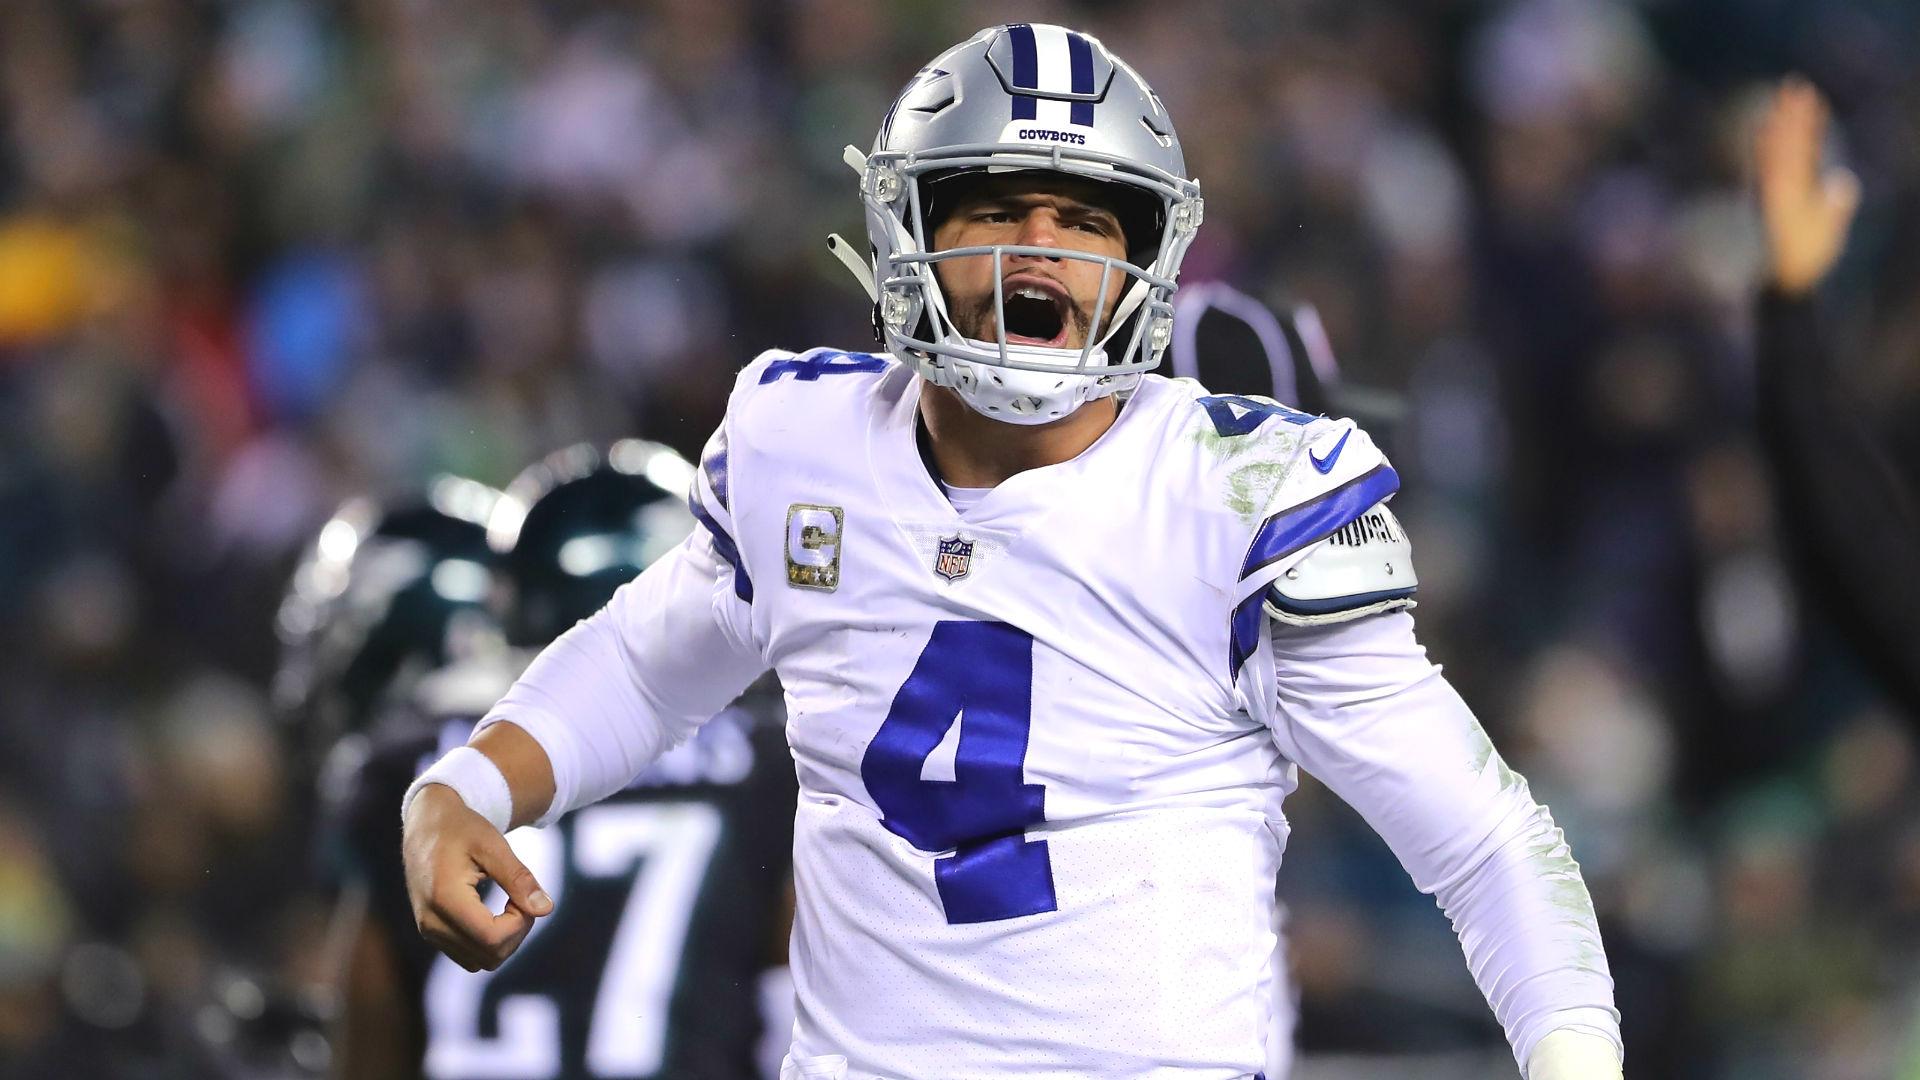 Dak Prescott contract: Twitter overreacts to shoddy report of QB rejecting huge Cowboys offer